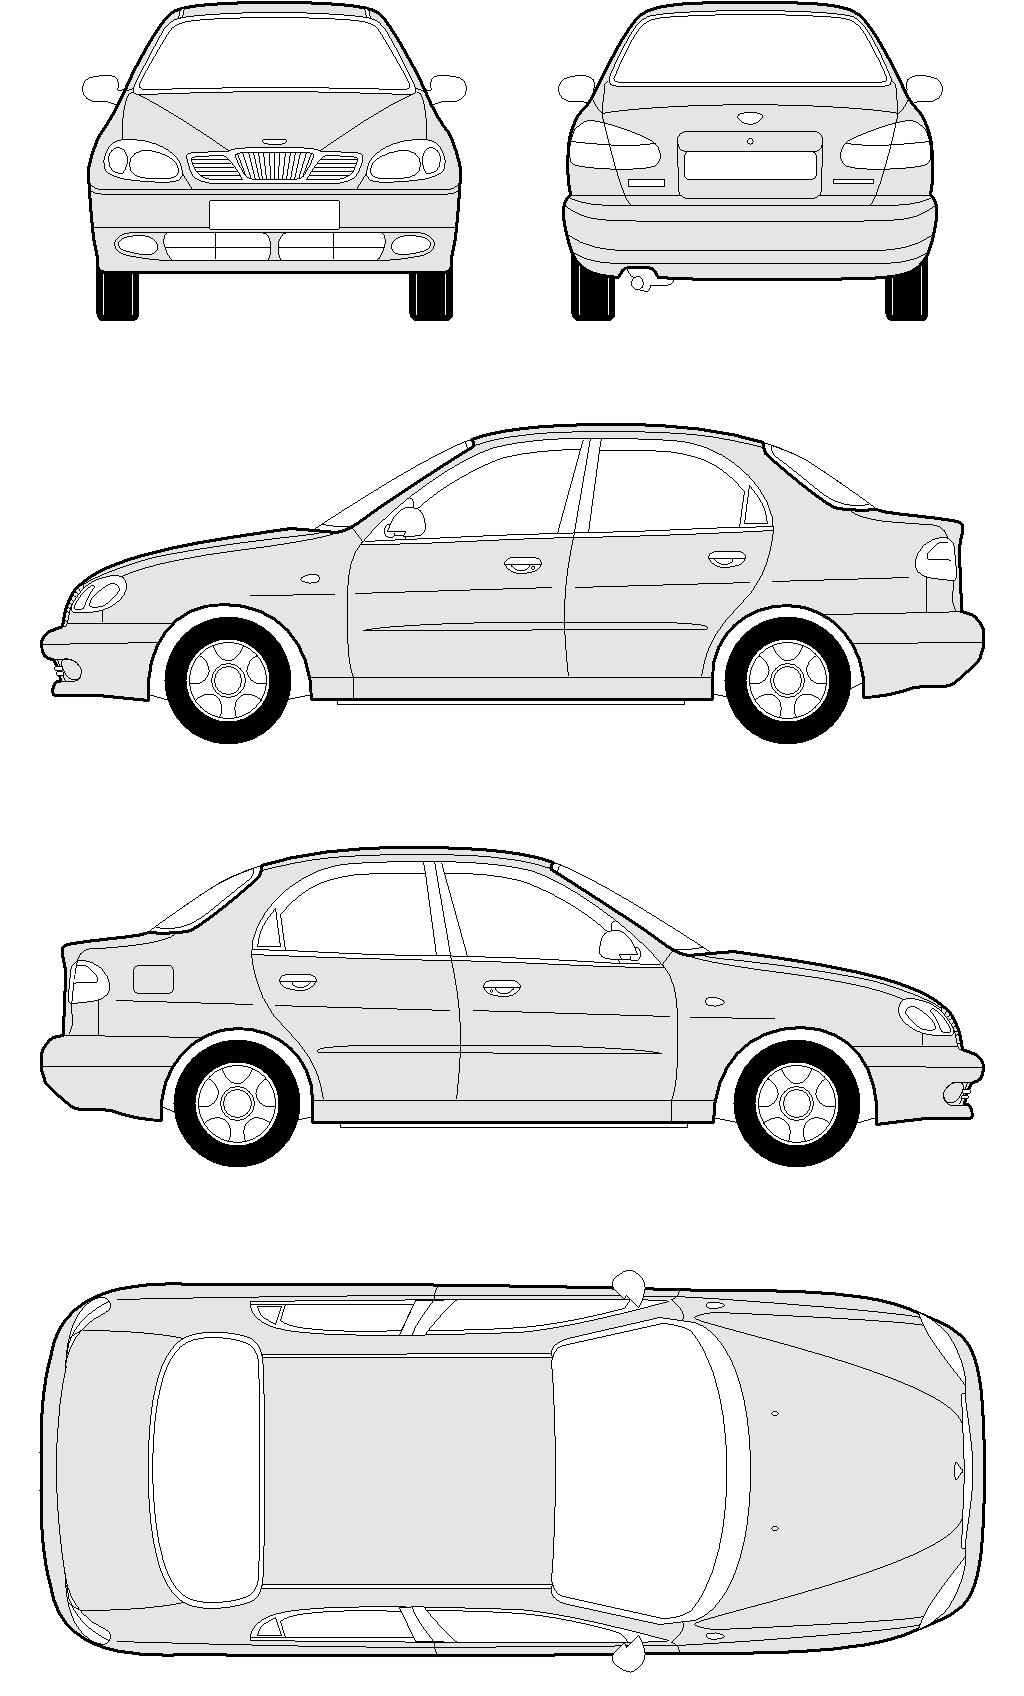 Daewoo Lanos blueprints